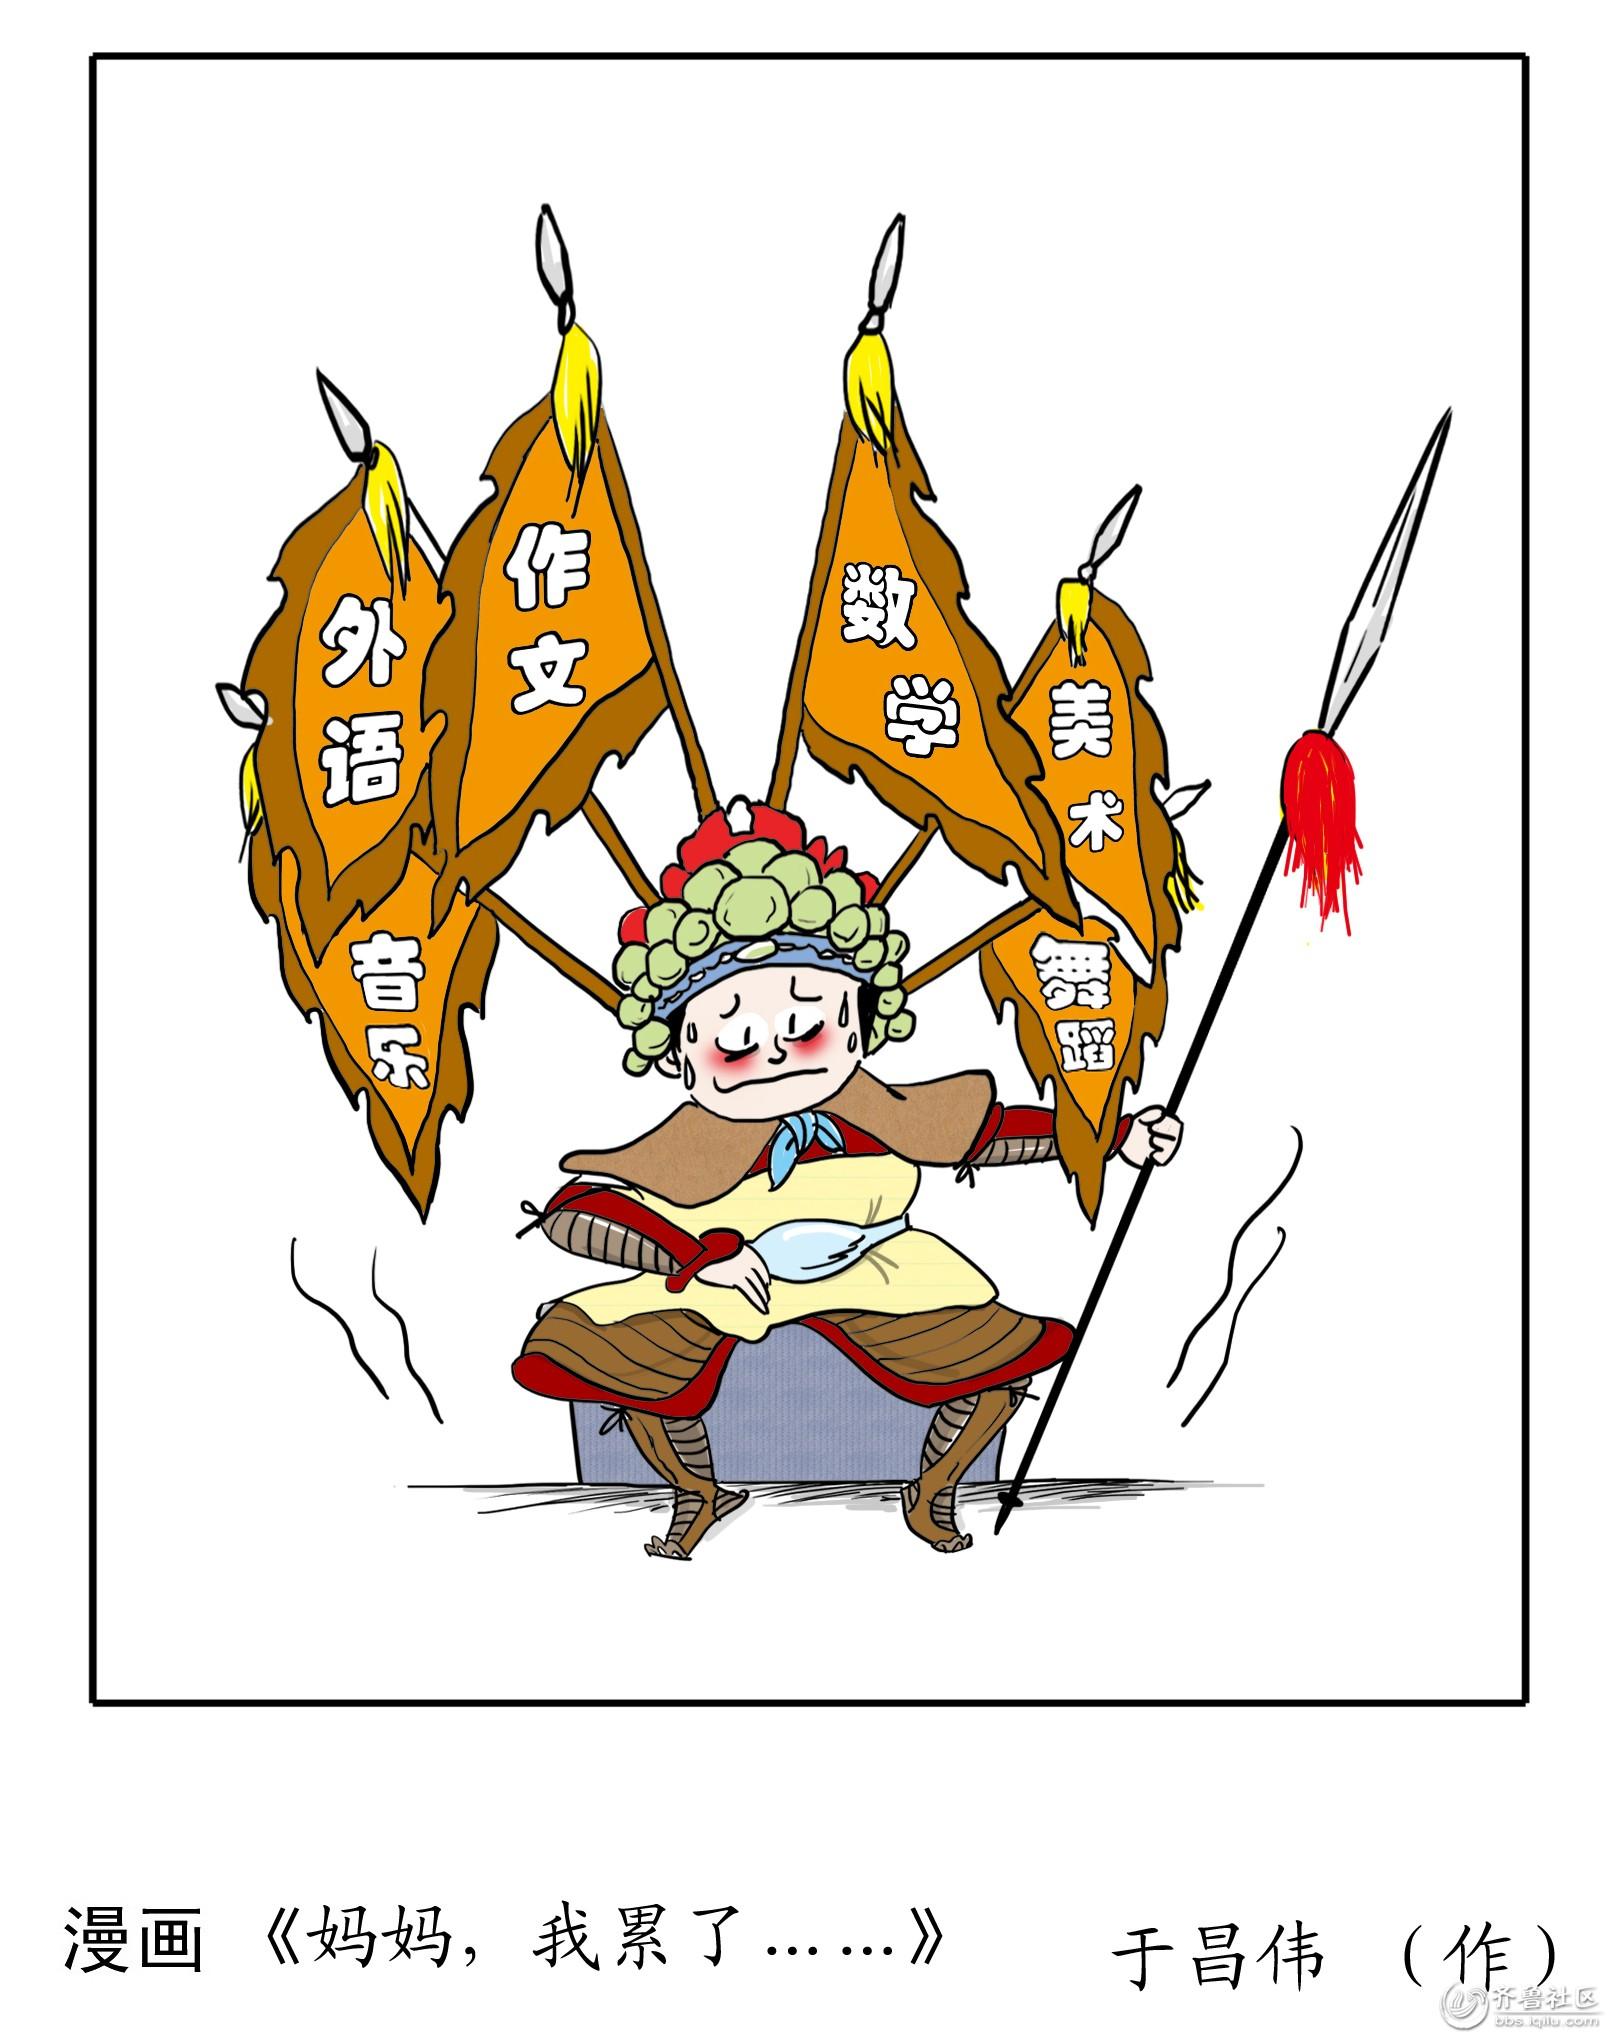 wb11漫画《妈妈,我累了……》.jpg